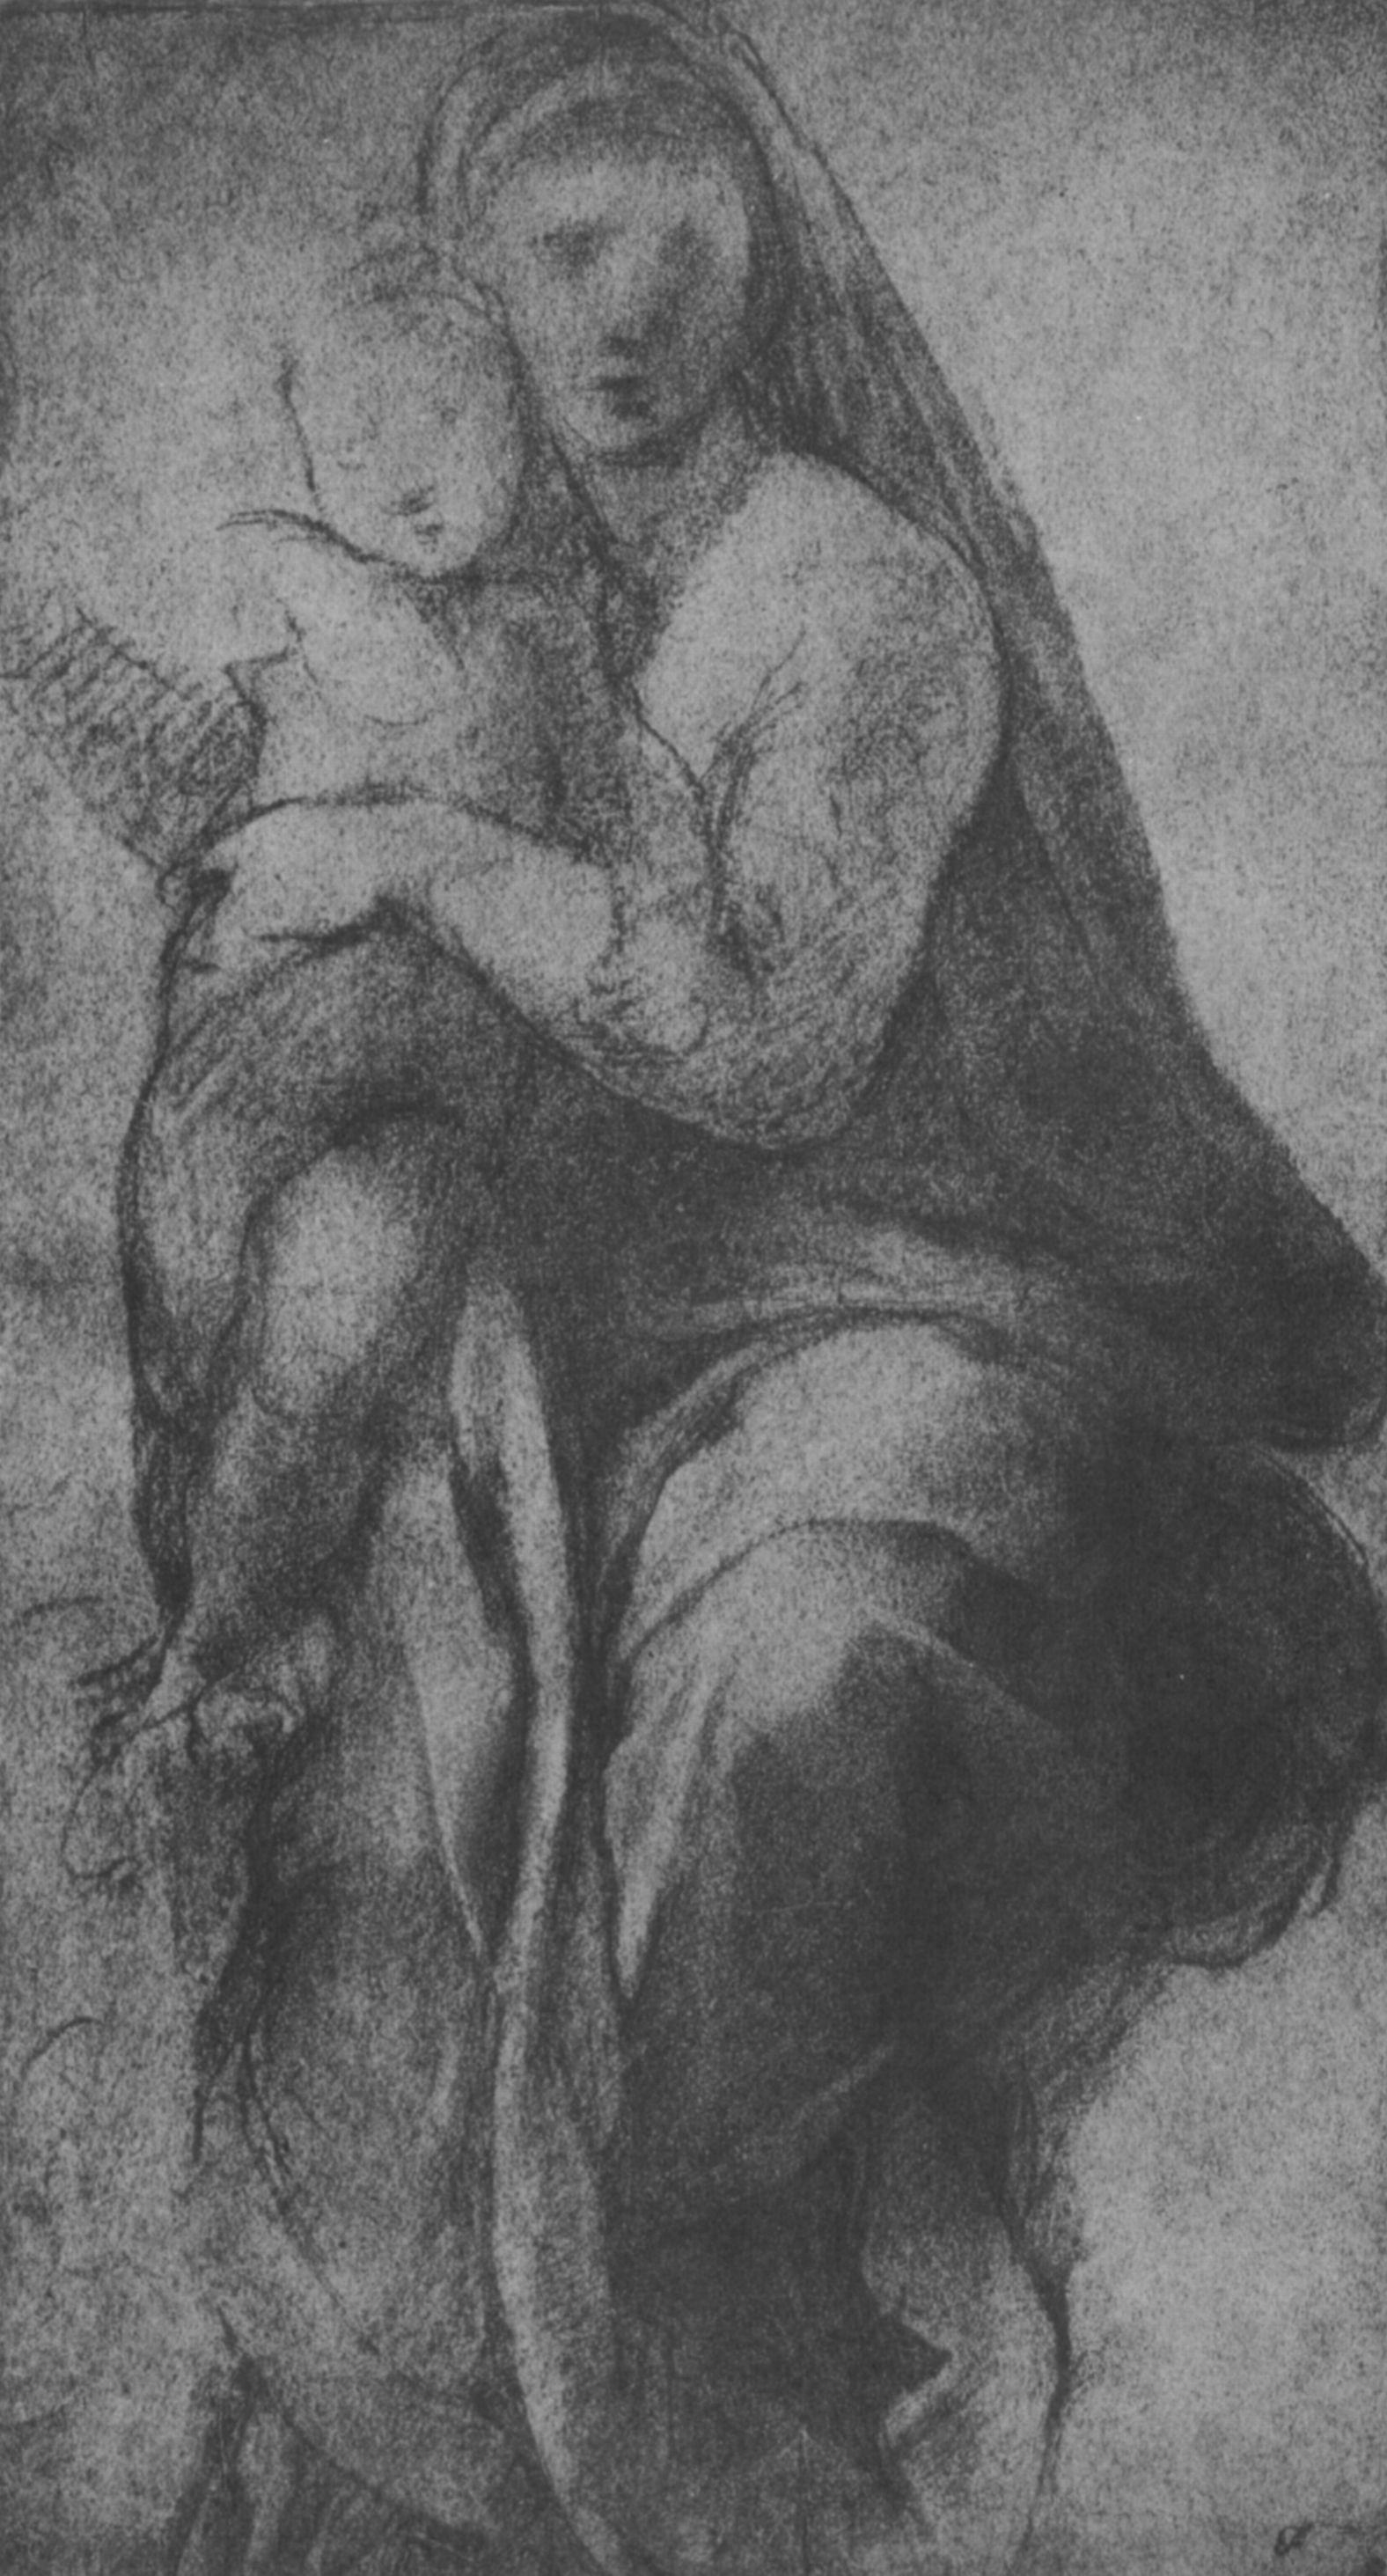 Raphael Sanzio. The Sistine Madonna. Sketch